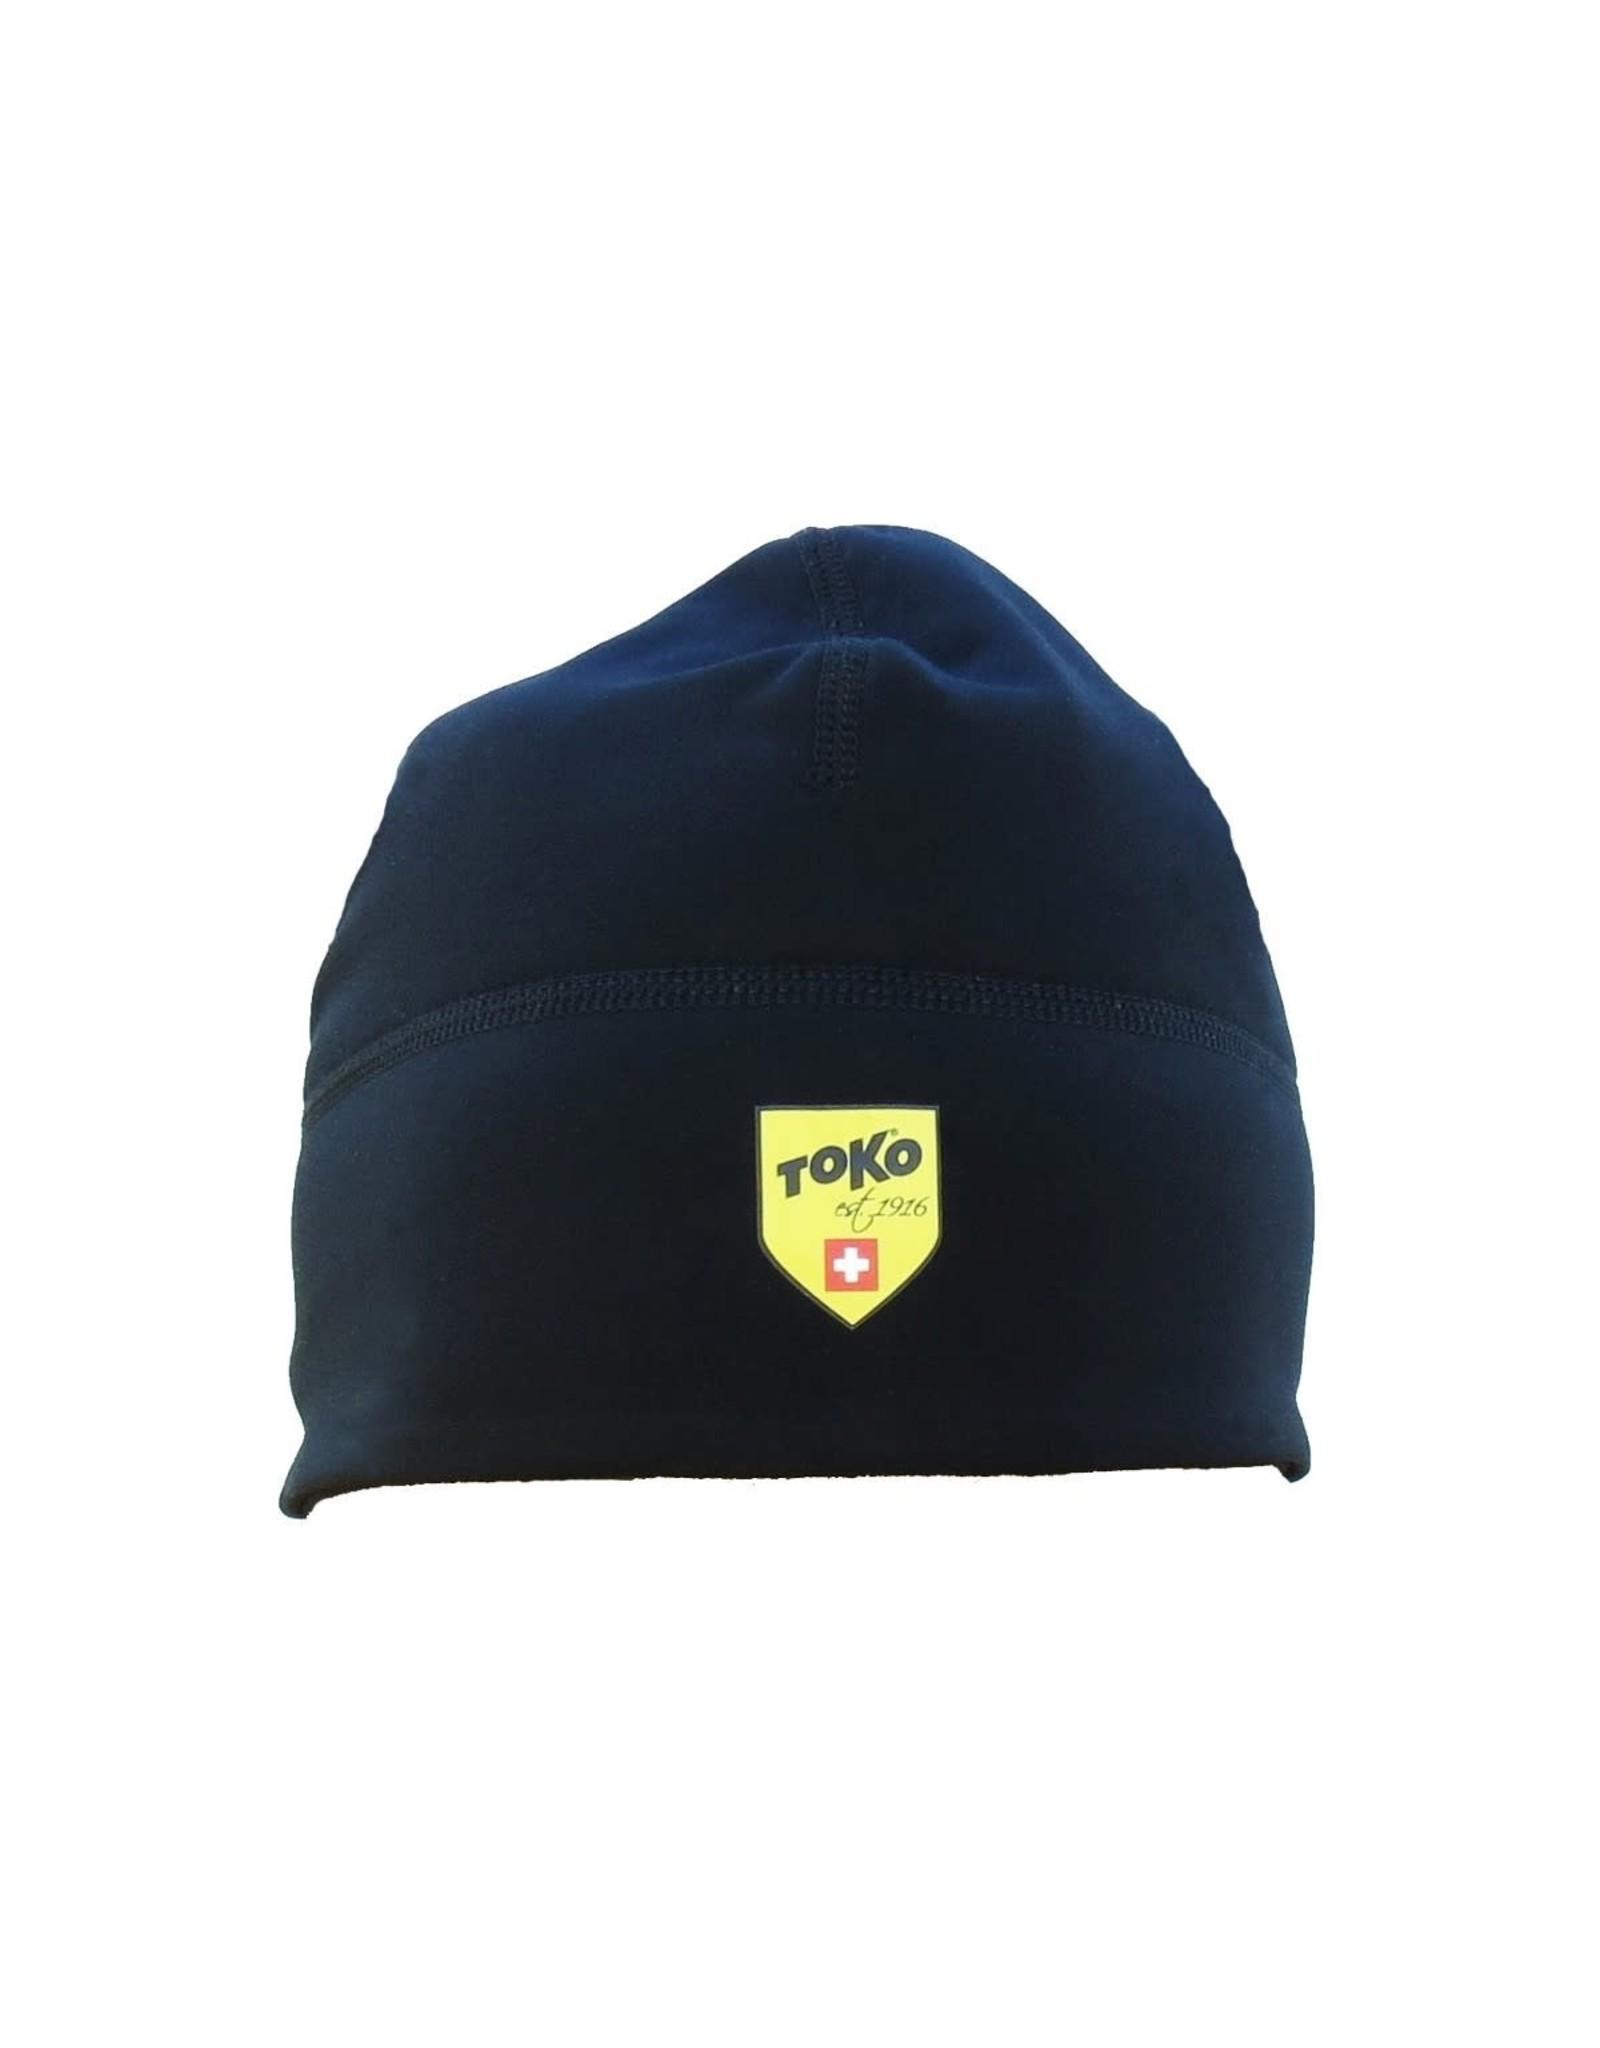 Toko Toko Thermo Hat